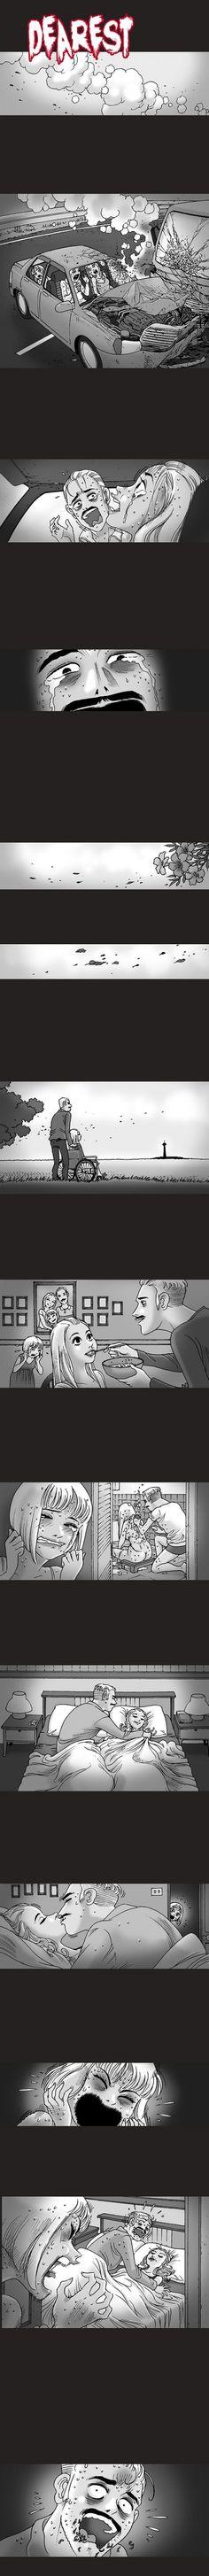 Amor en el matrimonio